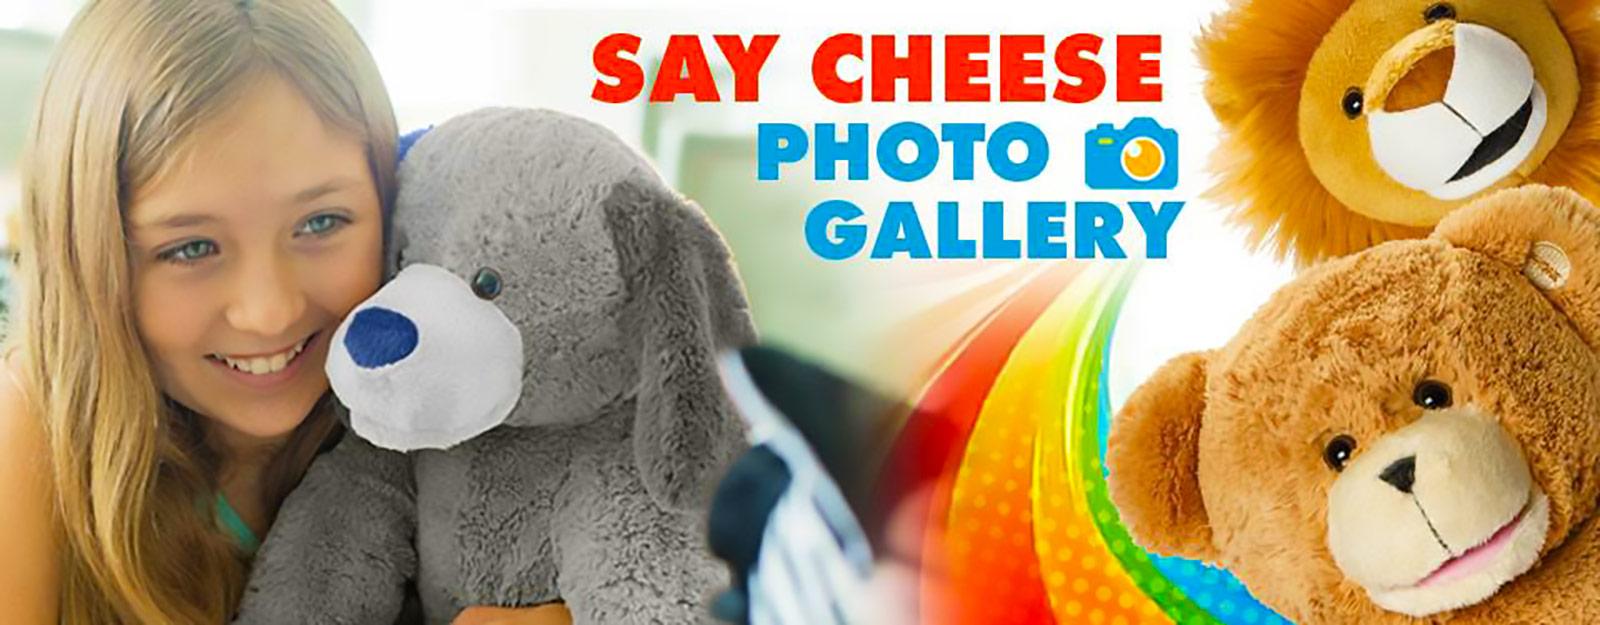 Bluebee Pals Photo Gallery